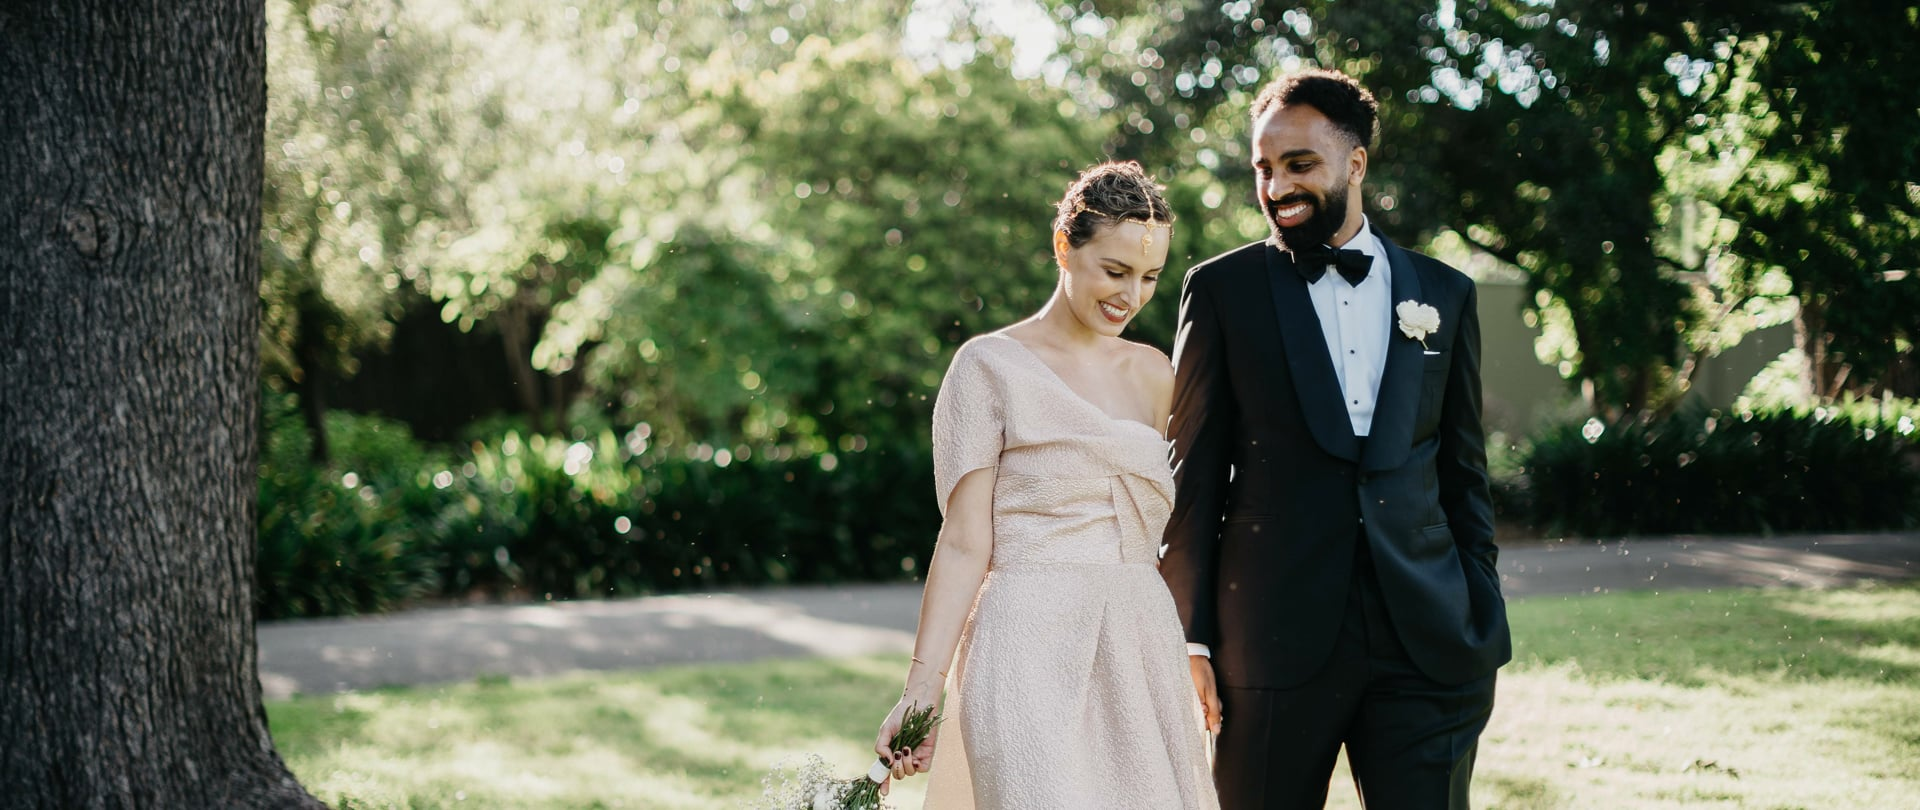 Gabi & Sam Wedding Video Filmed at Melbourne, Victoria